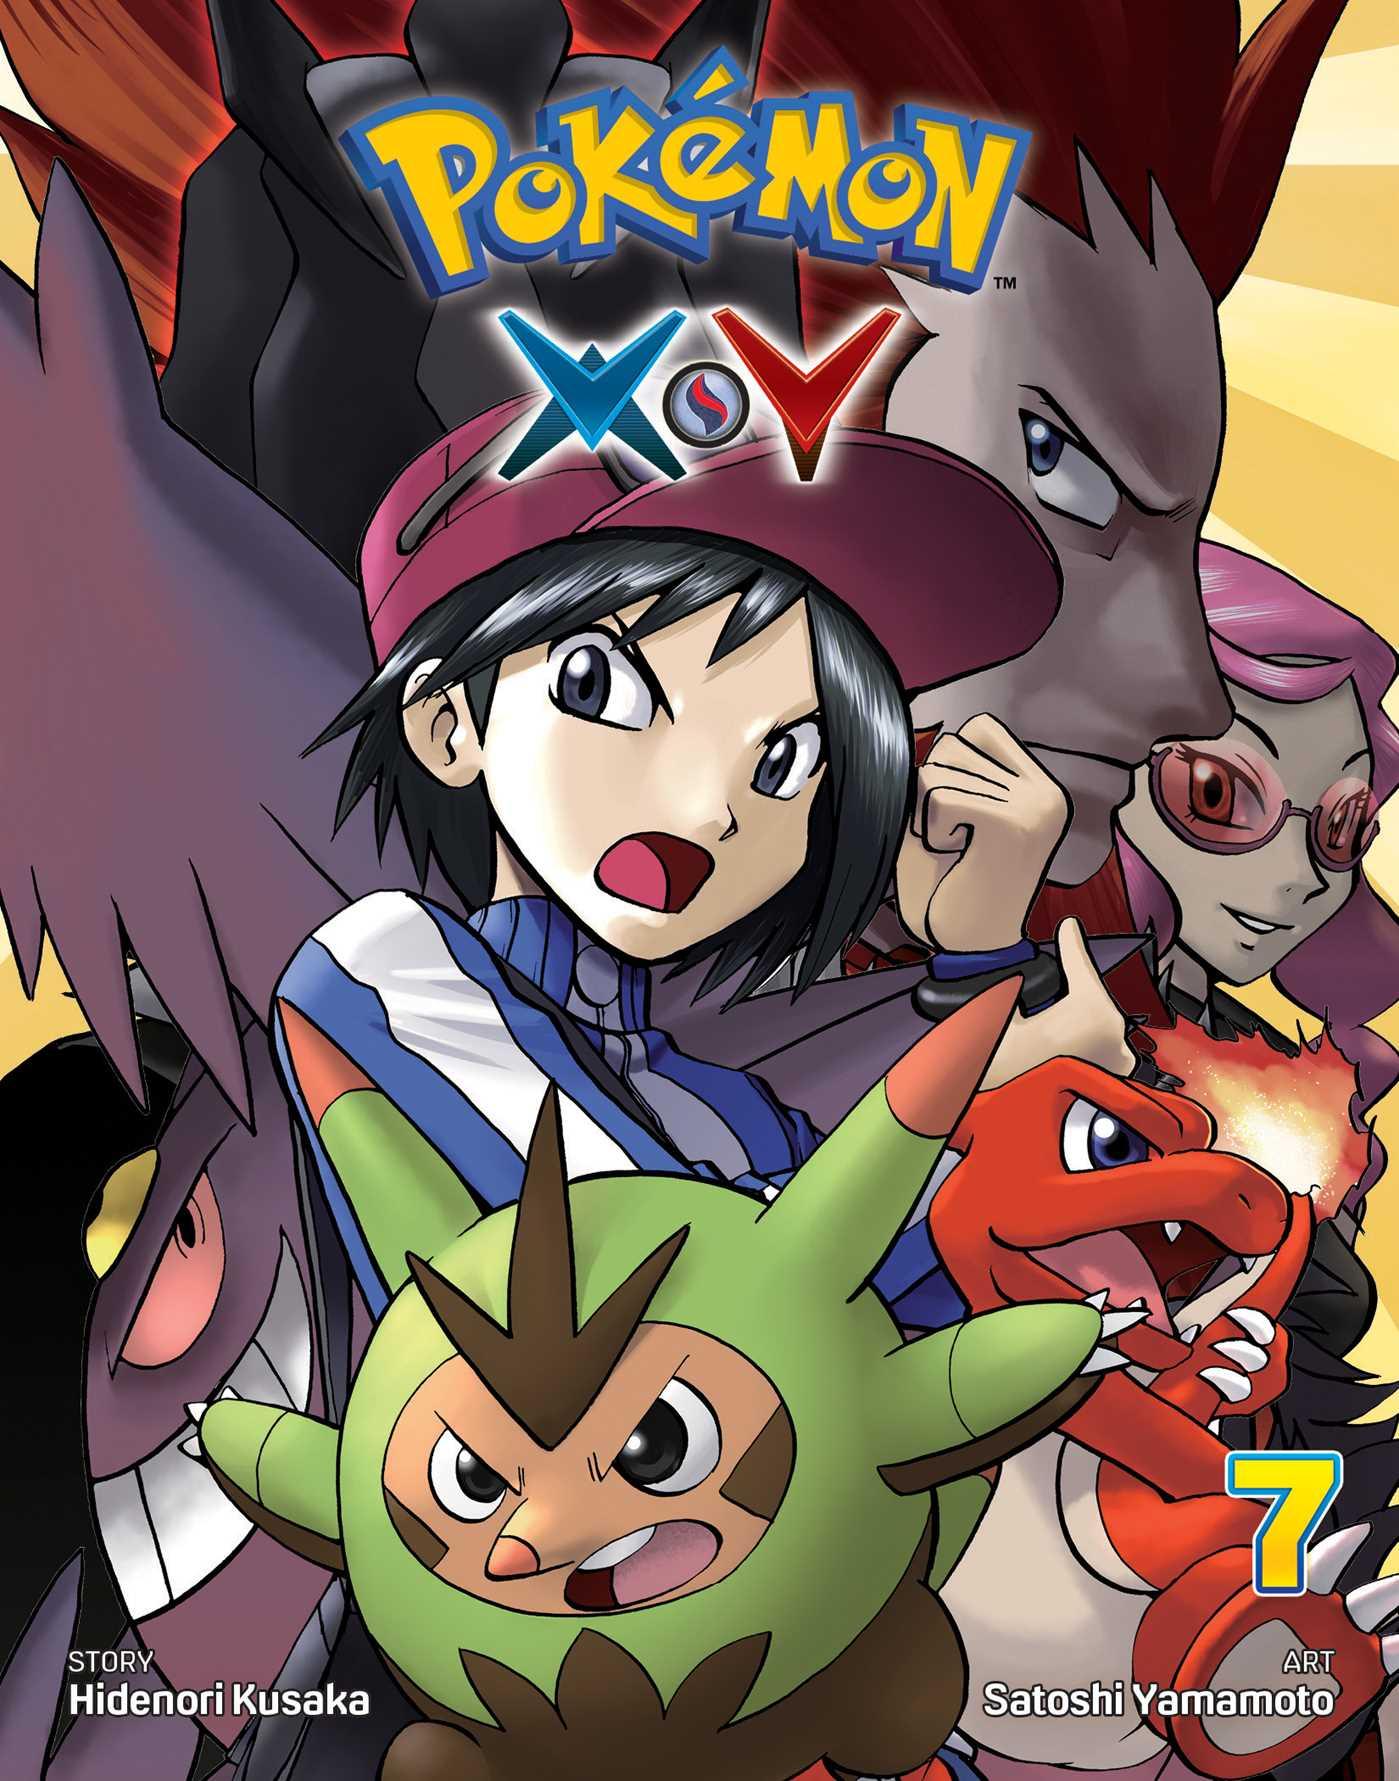 X And Y Anime Characters : Pokemon and y characters anime pixshark